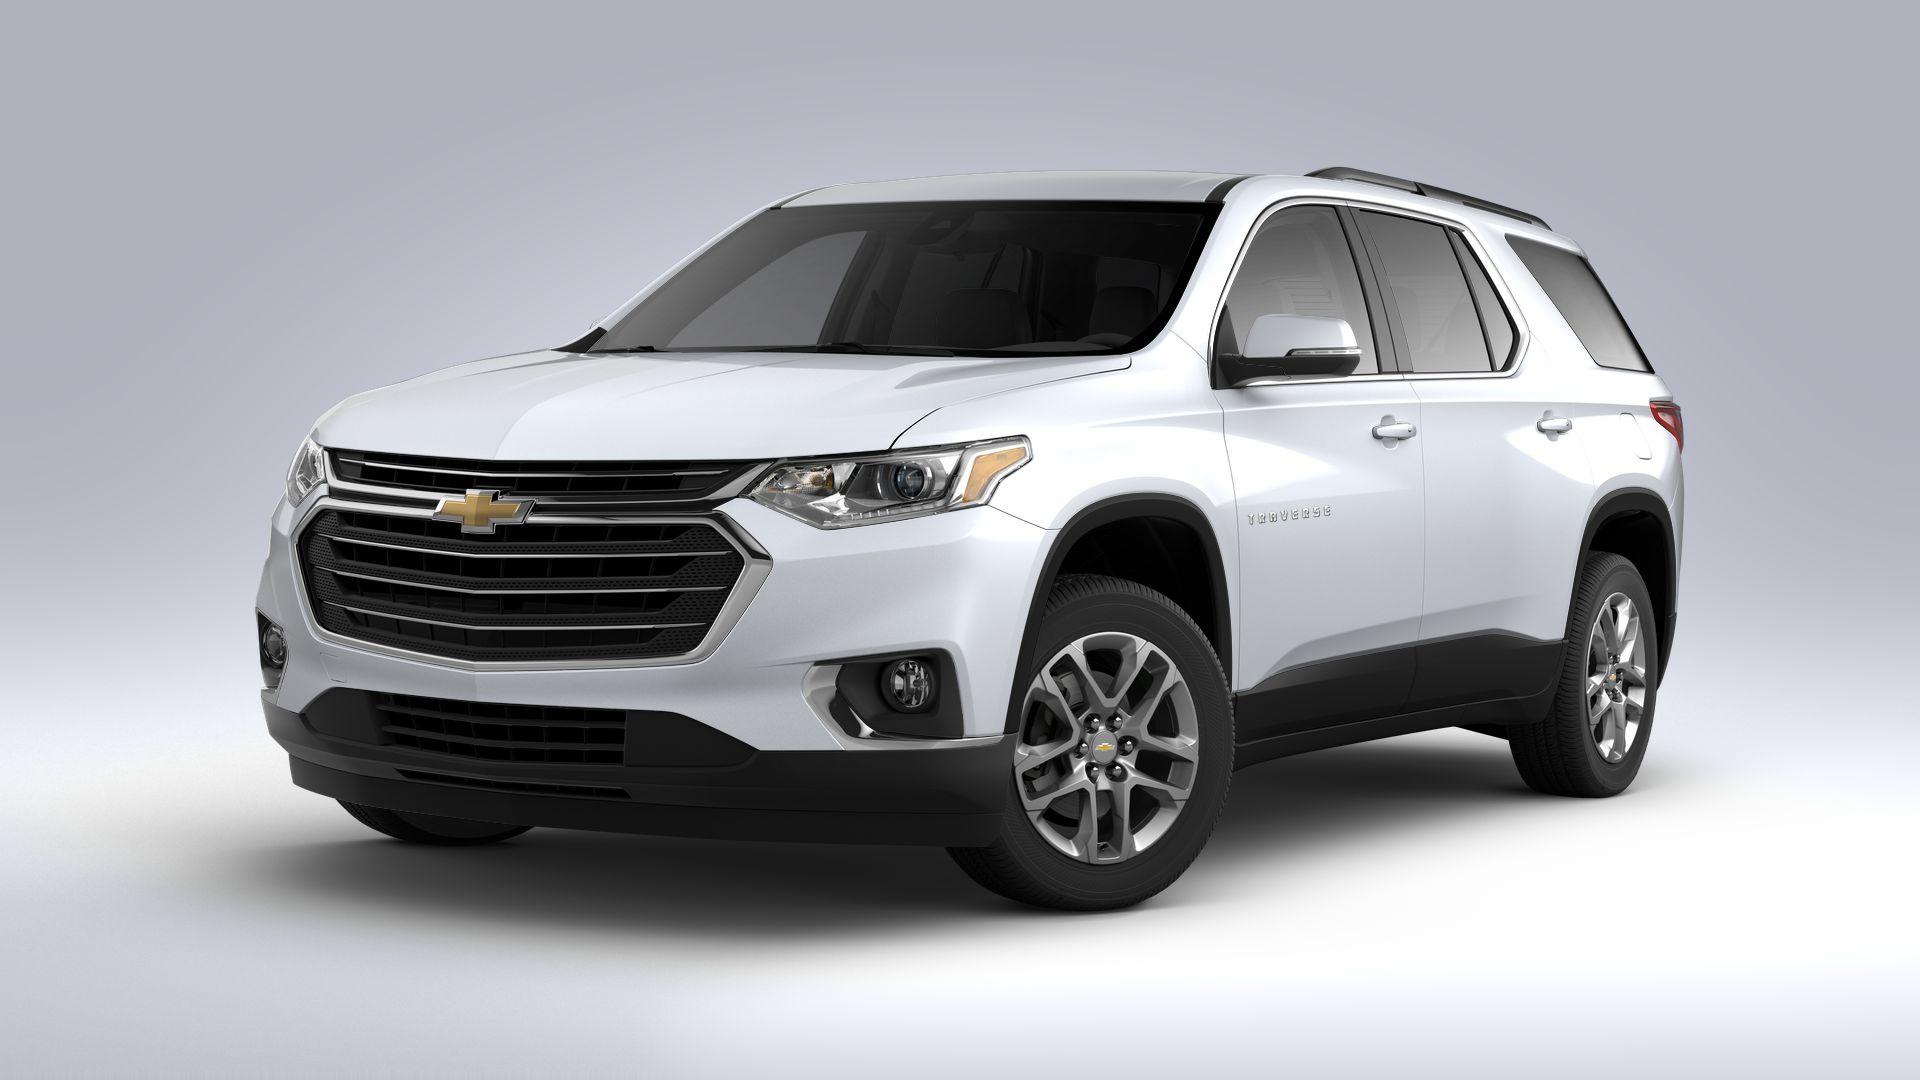 2021 Chevrolet Traverse Cuyahoga Falls OH